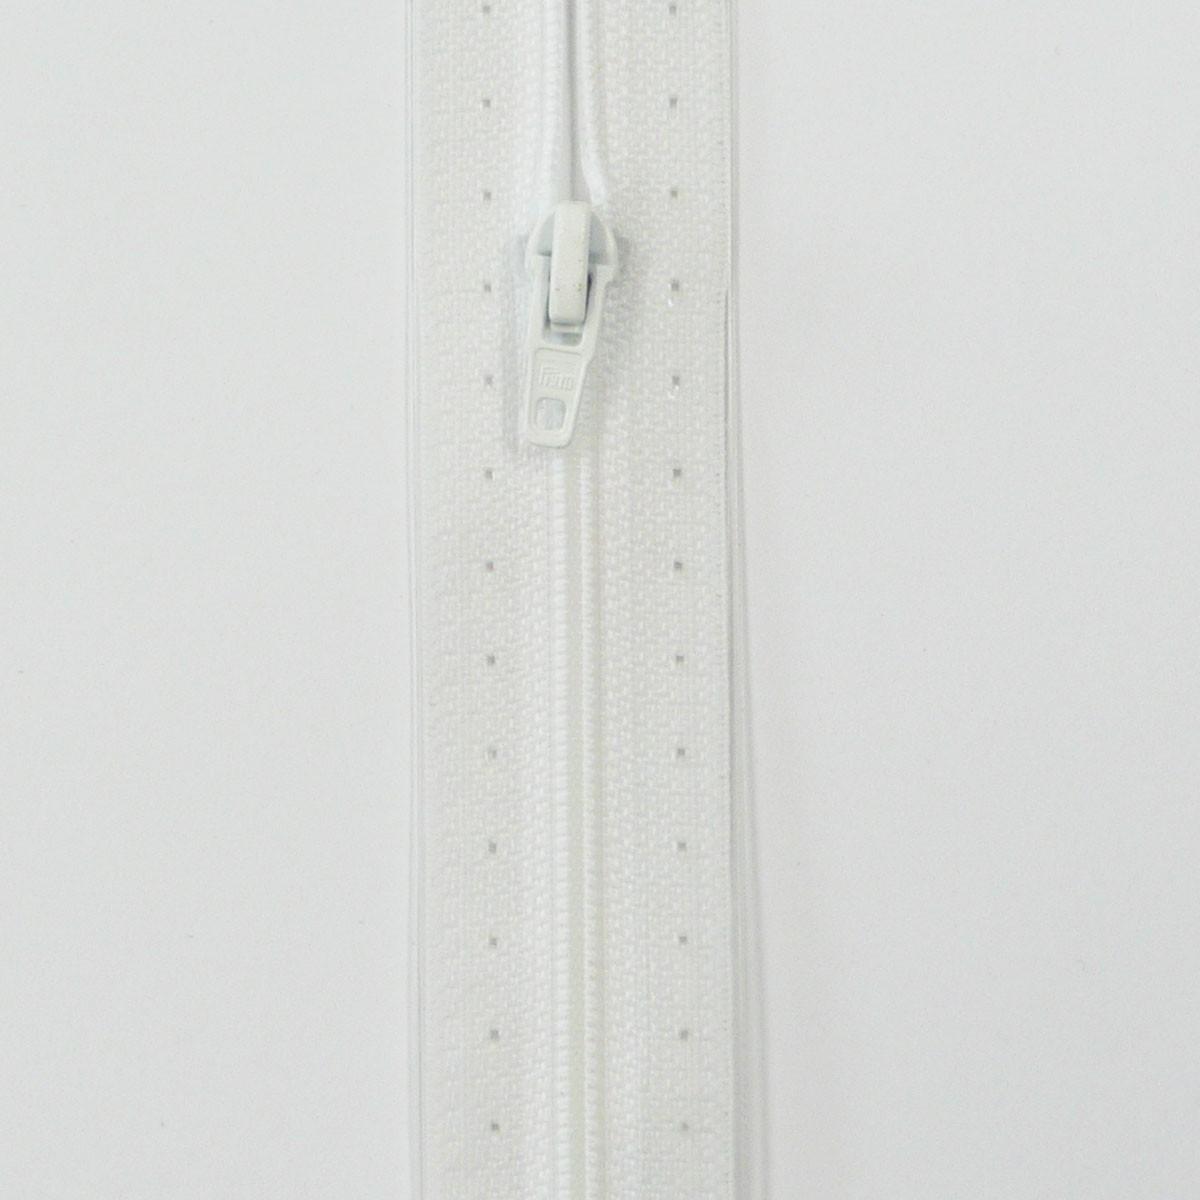 RV S1 Typ 0 ut 12 cm Fla weiß